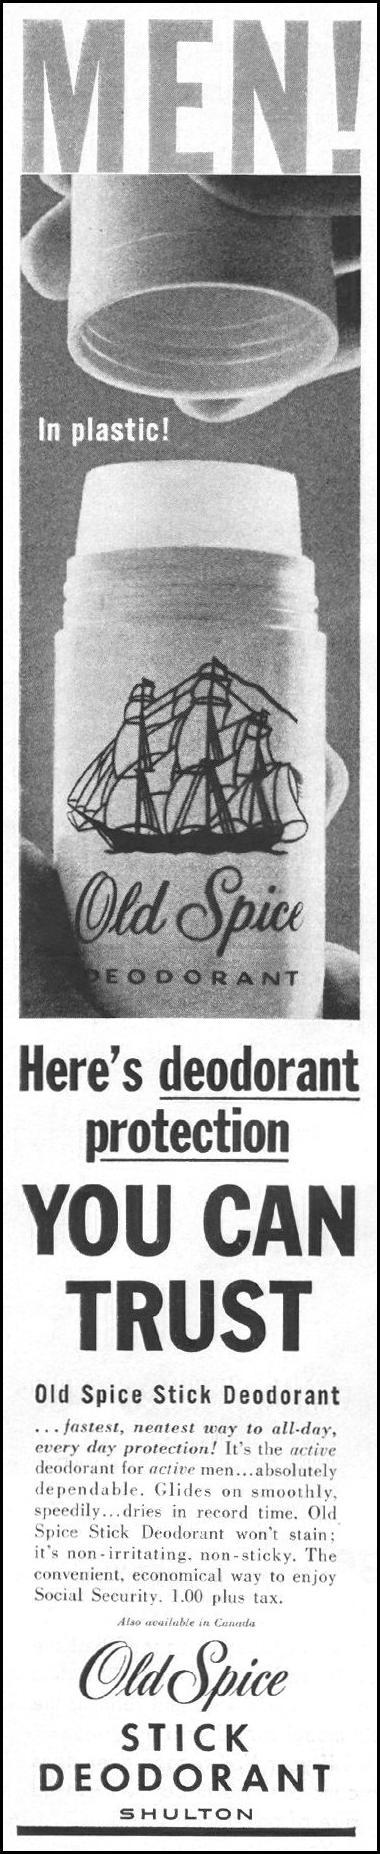 OLD SPICE STICK DEODORANT LIFE 05/05/1961 p. 90